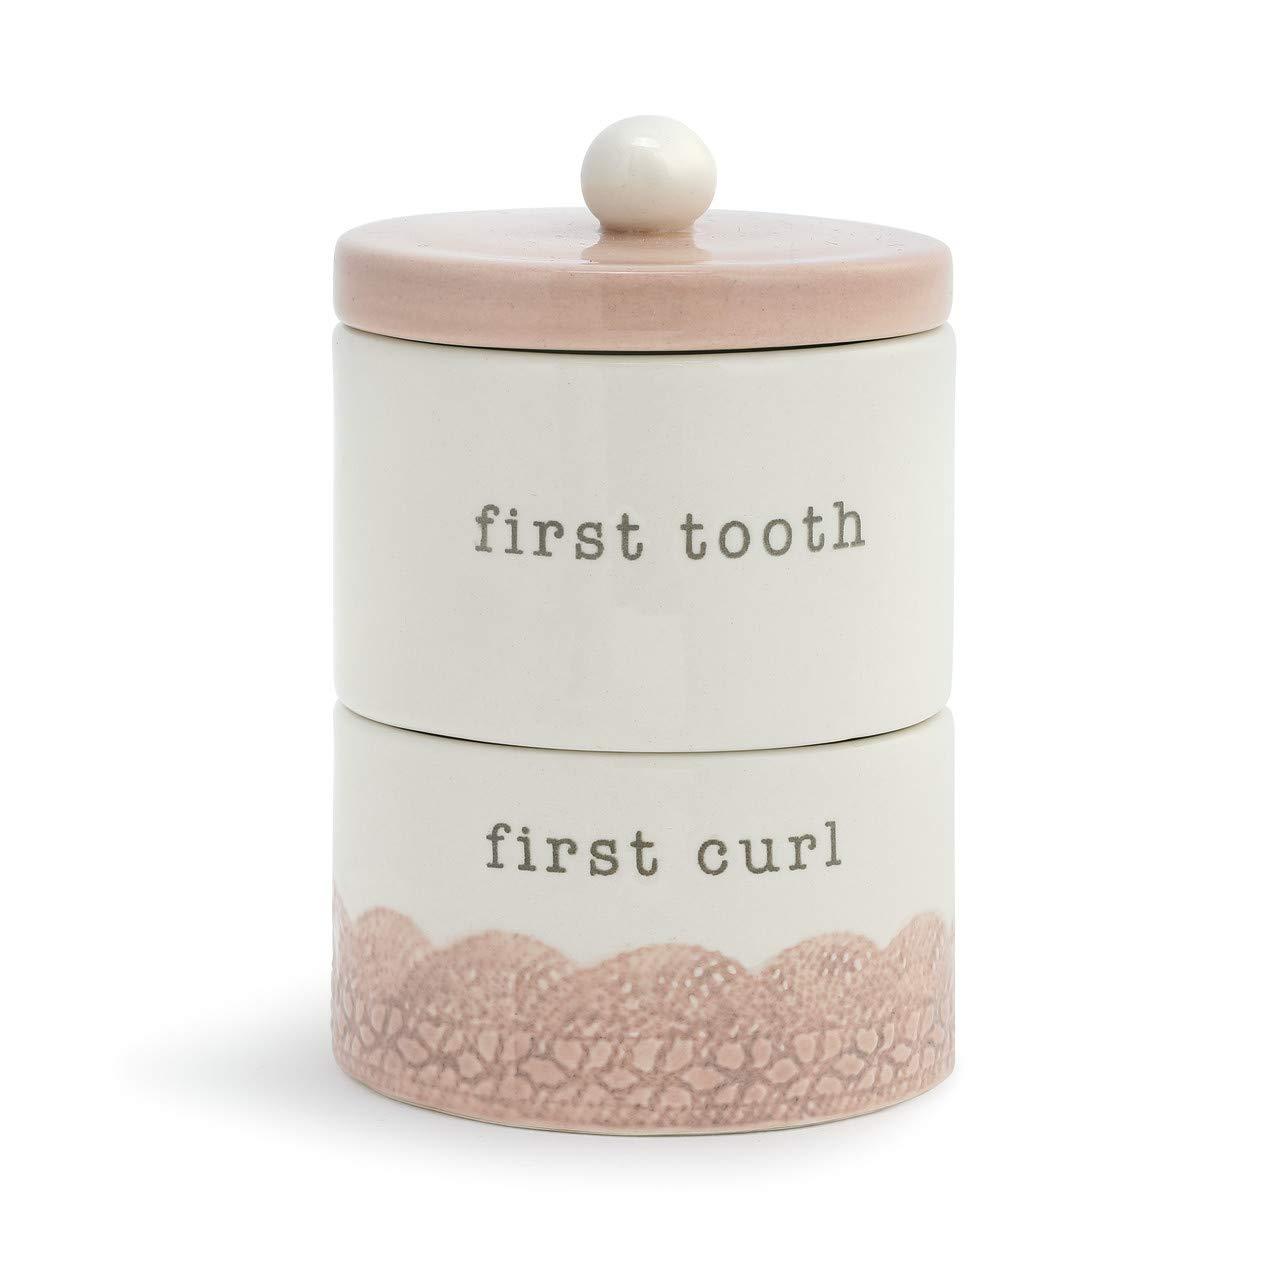 Tooth and Curl Stacking Glossy Pink 4 x 3 Ceramic Stoneware Baby Keepsake Box